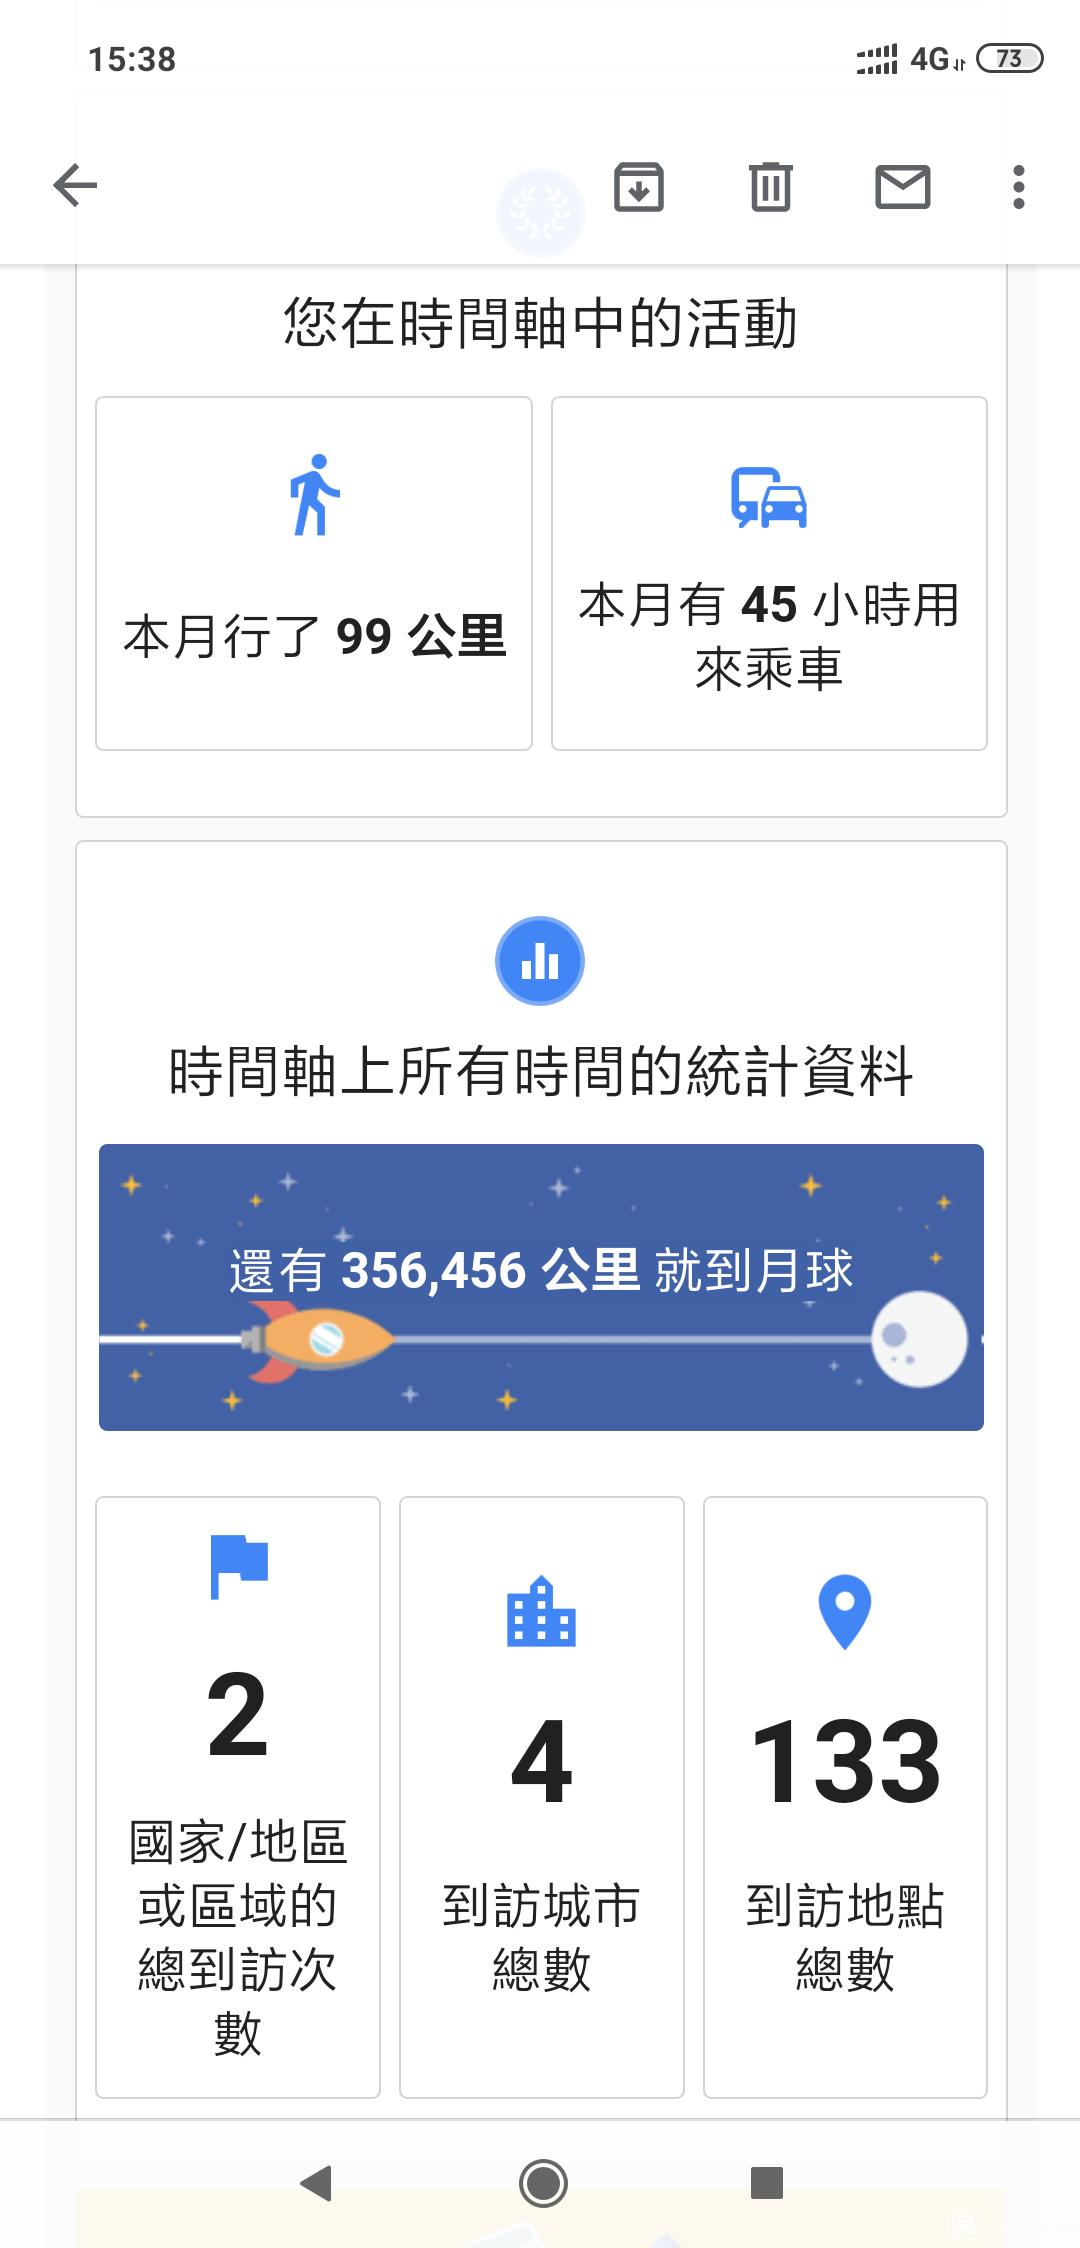 Screenshot_2019-04-10-15-38-03-169_com.google.android.gm.png